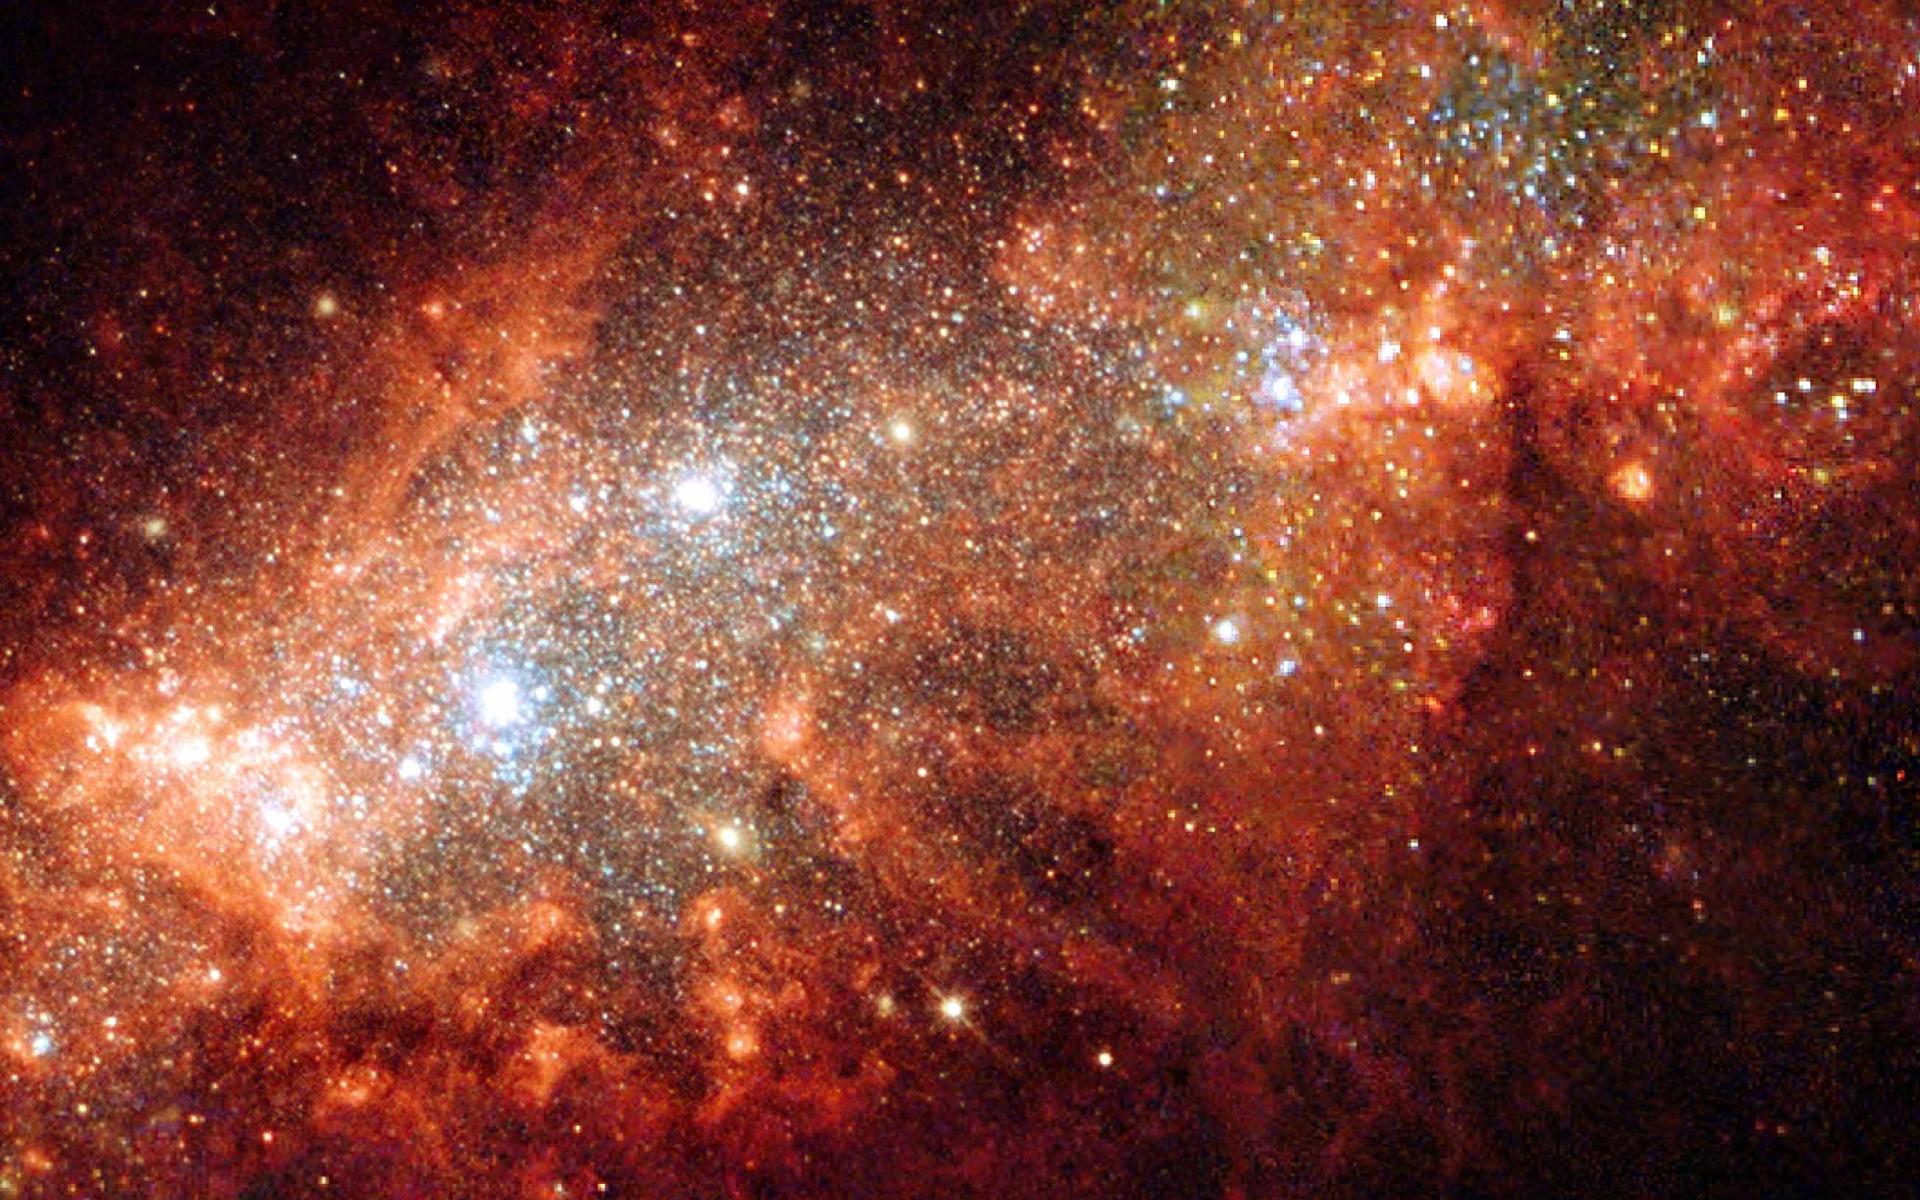 Hubble Telescope Wallpaper - WallpaperSafari